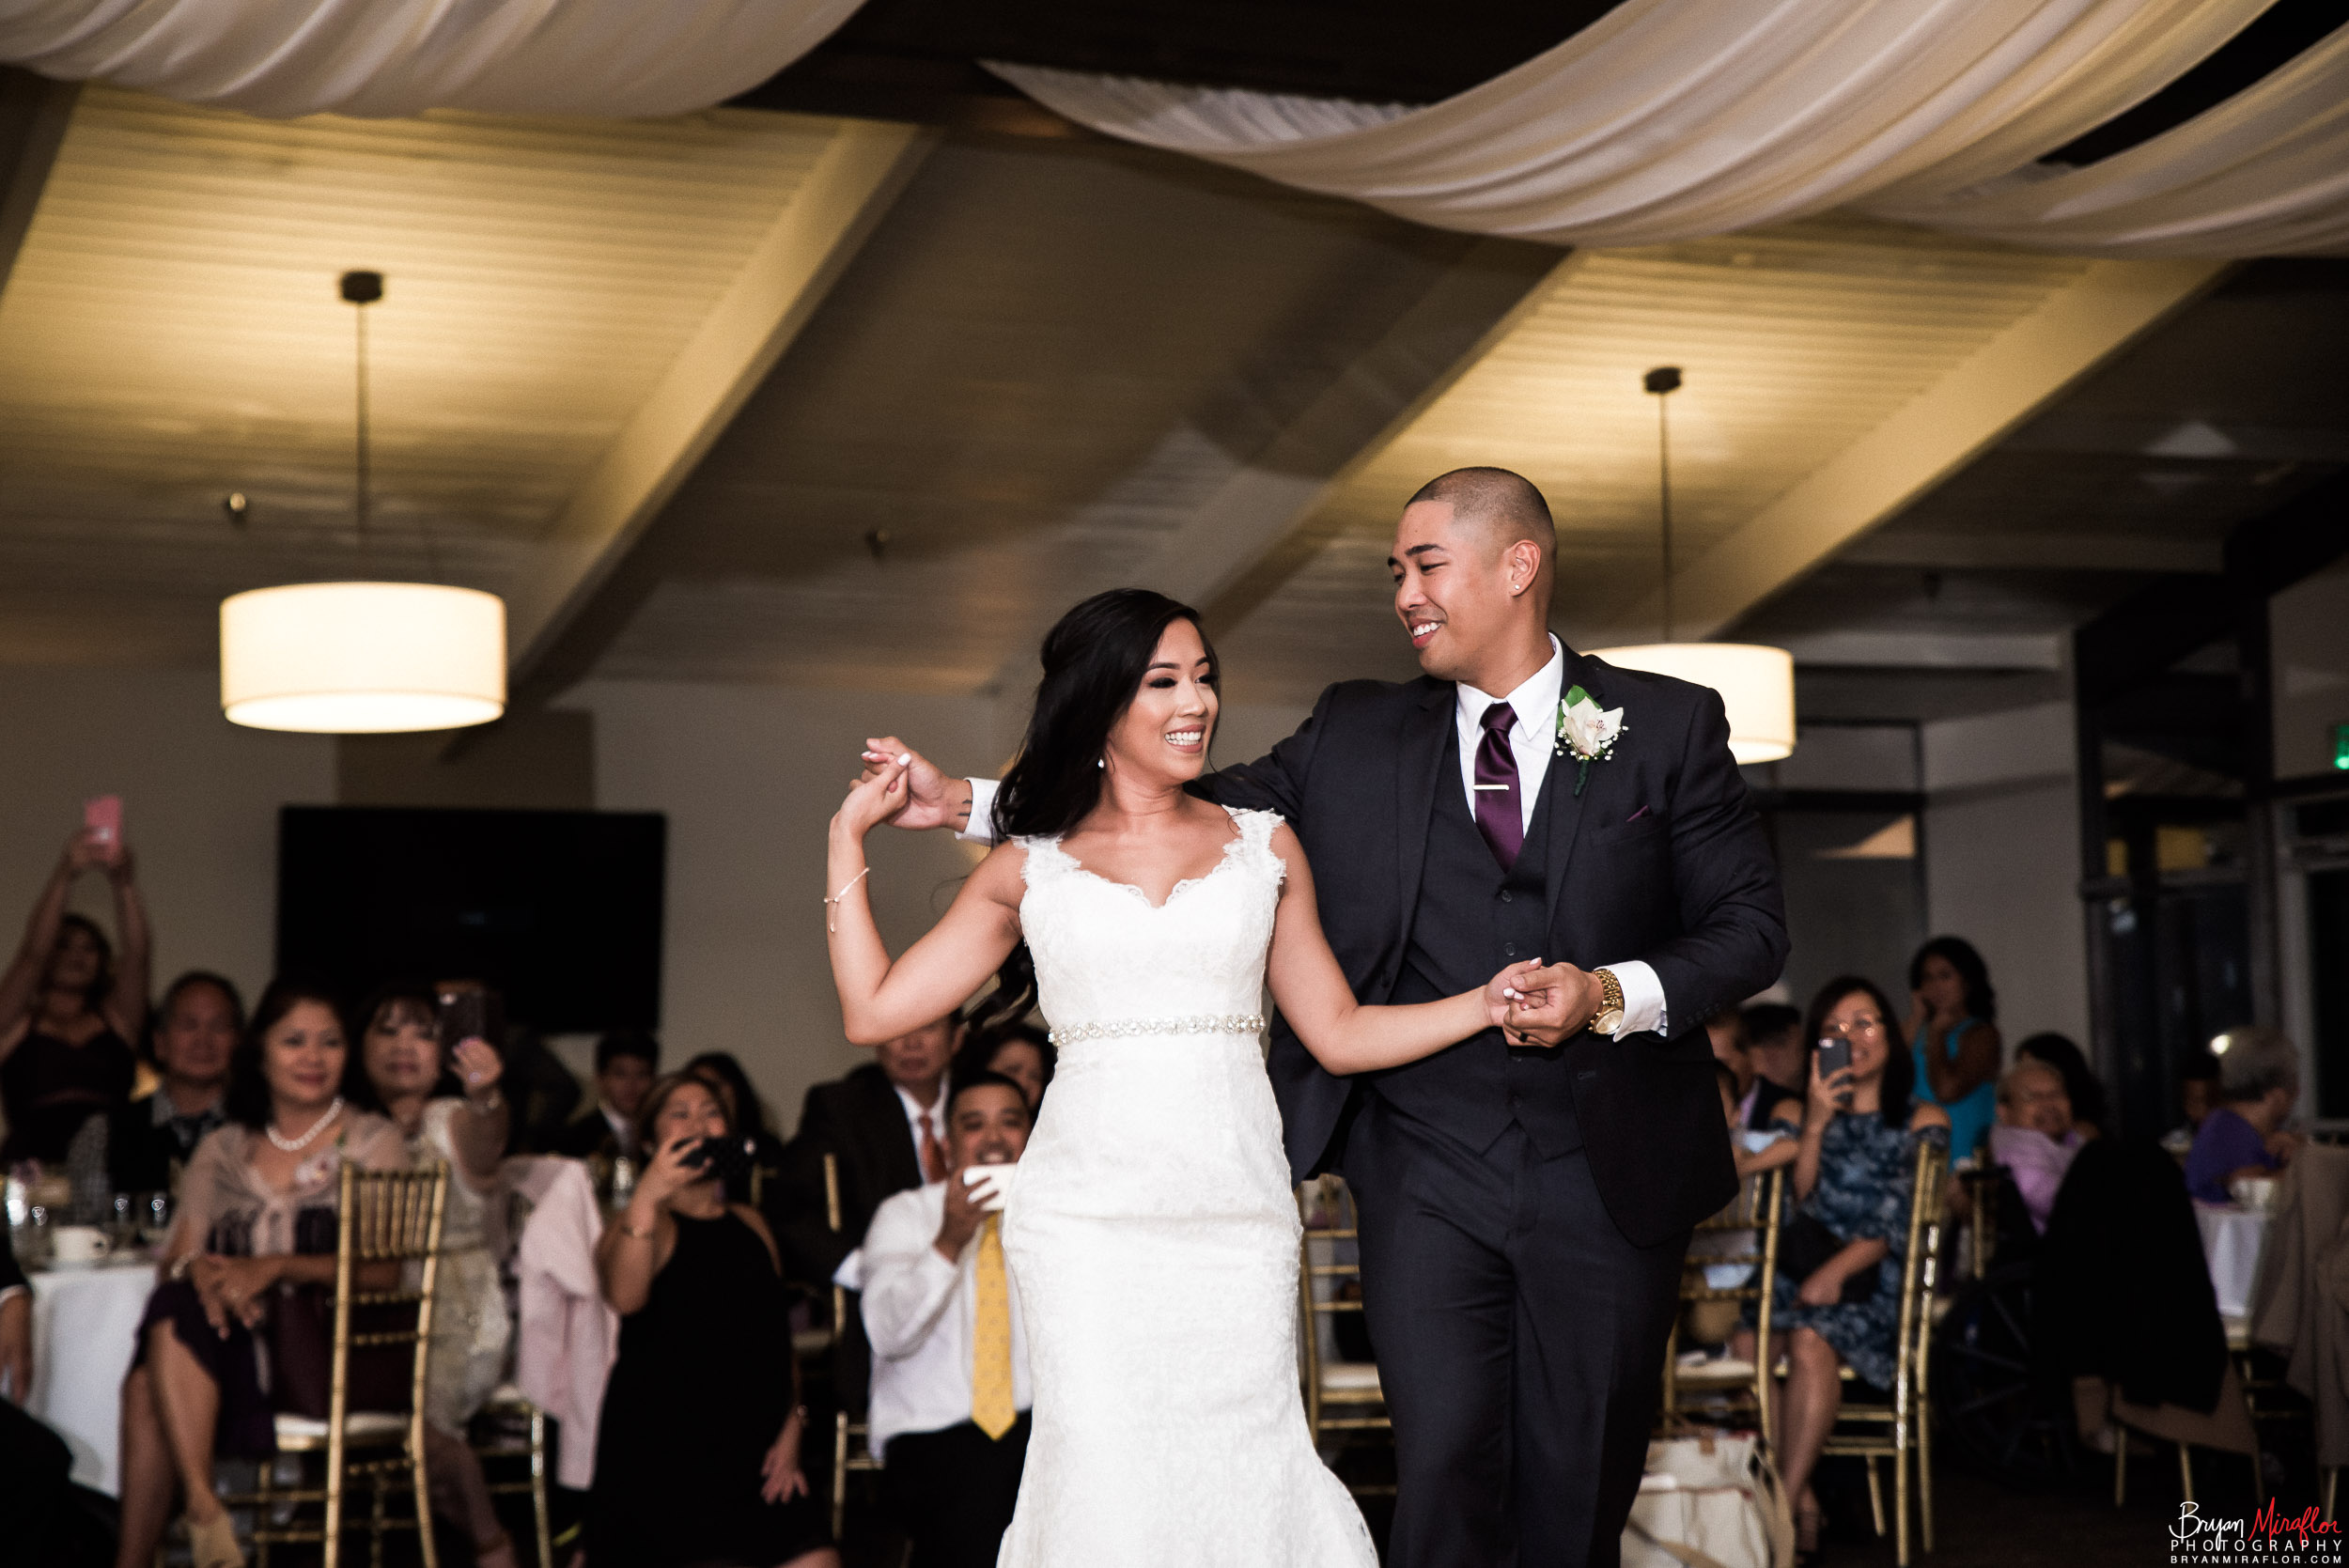 Bryan-Miraflor-Photography-Trisha-Dexter-Married-20170923-066.jpg